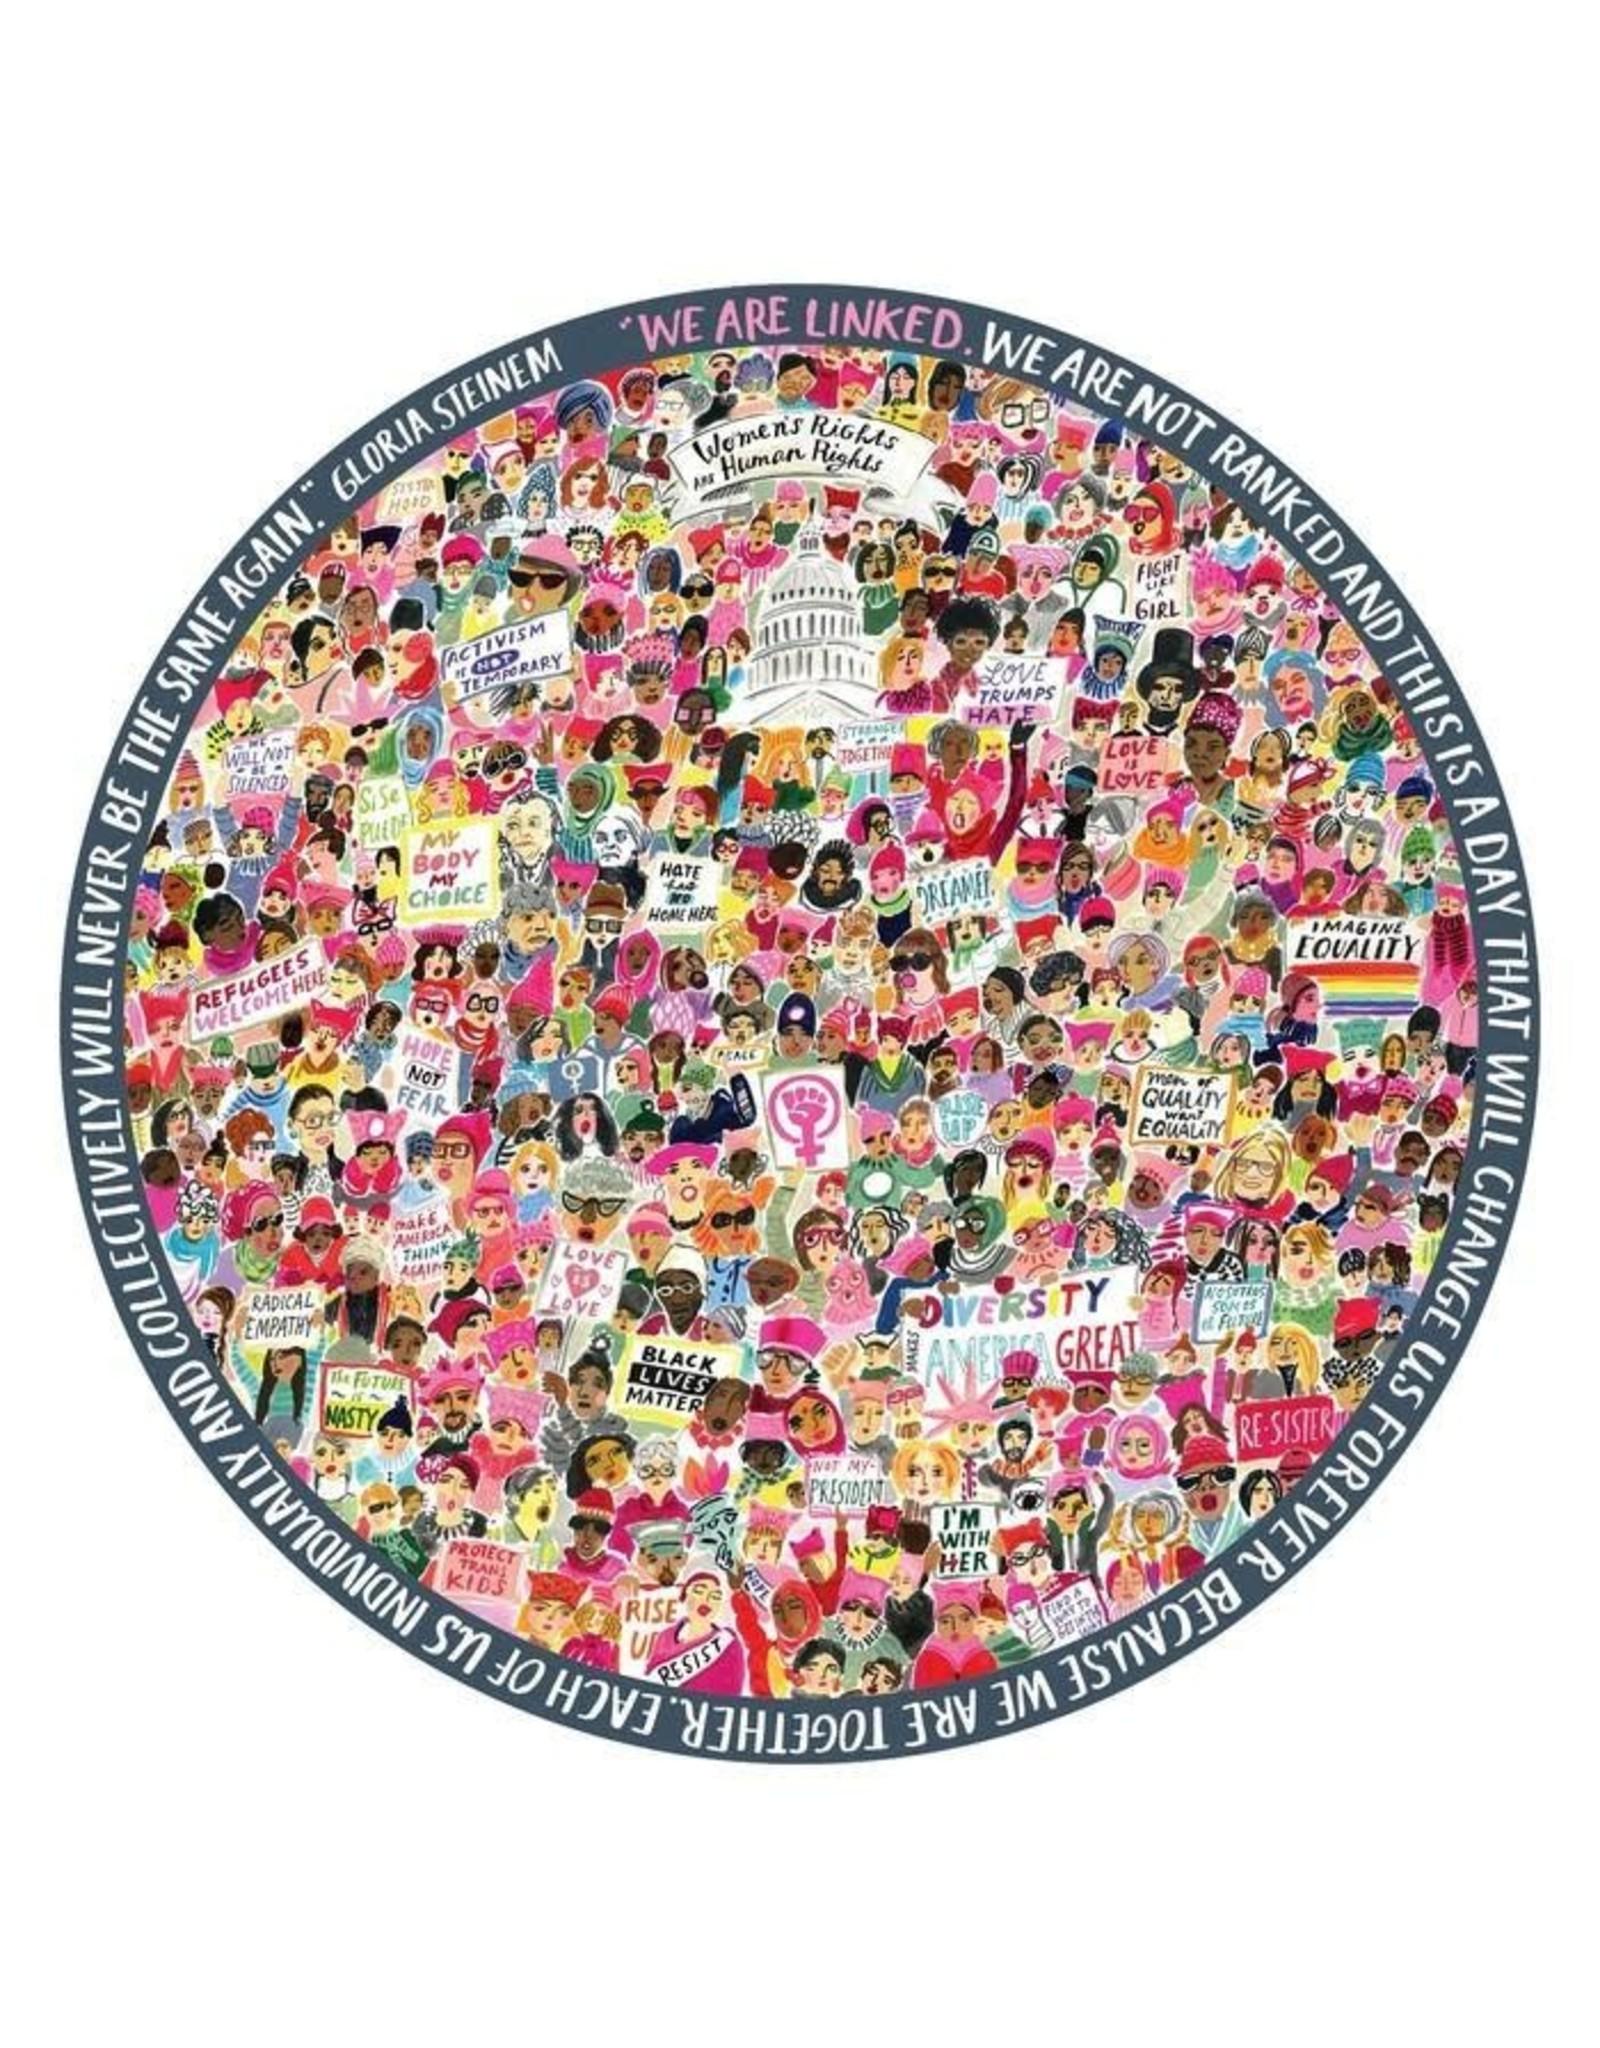 Women's March Puzzle, 500 Pieces, ROUND